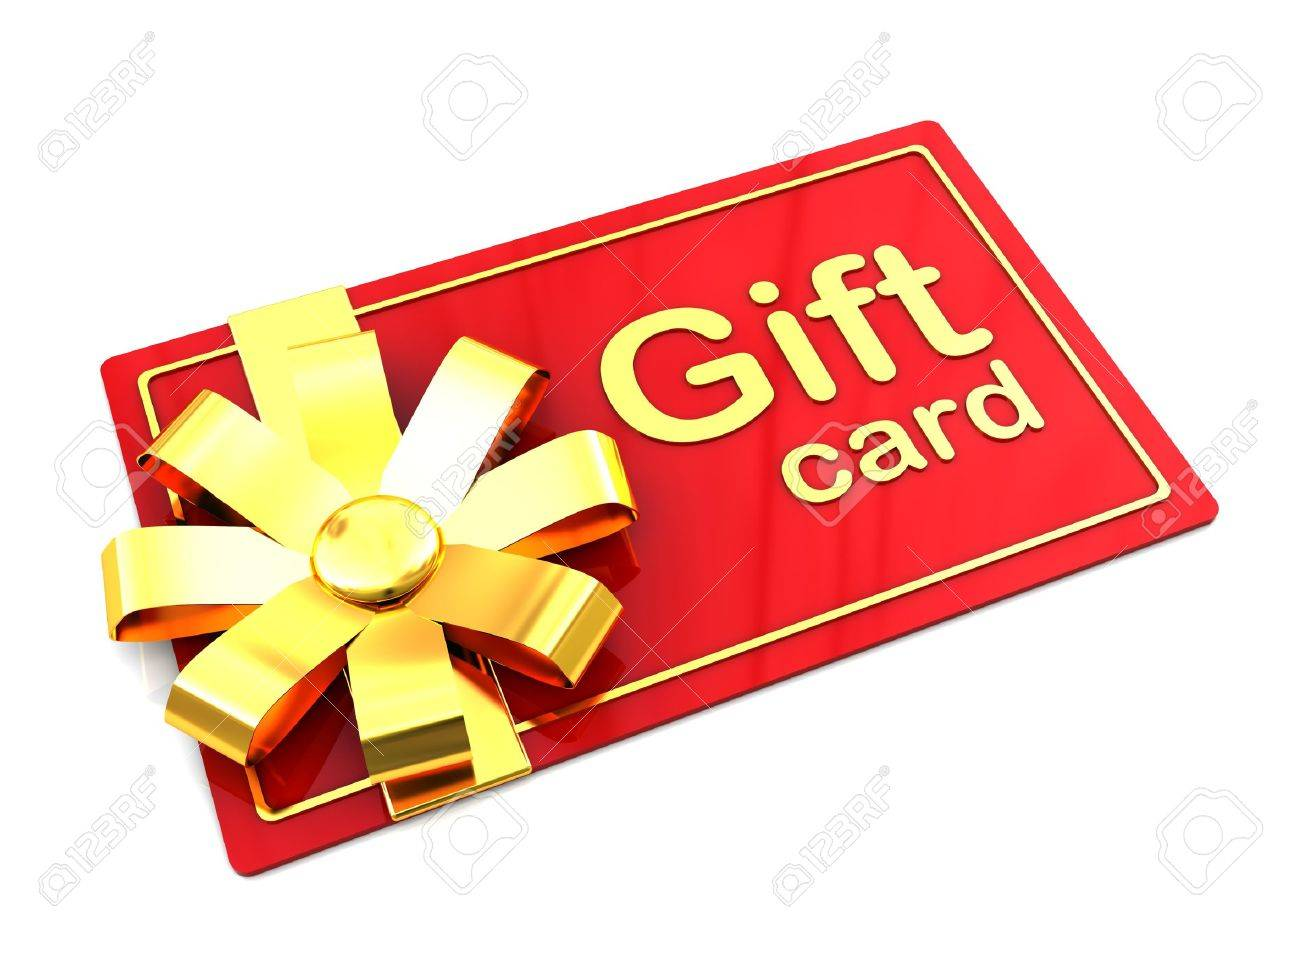 3d Illustration Of Plastic Gift Card Over White Background Stock ...